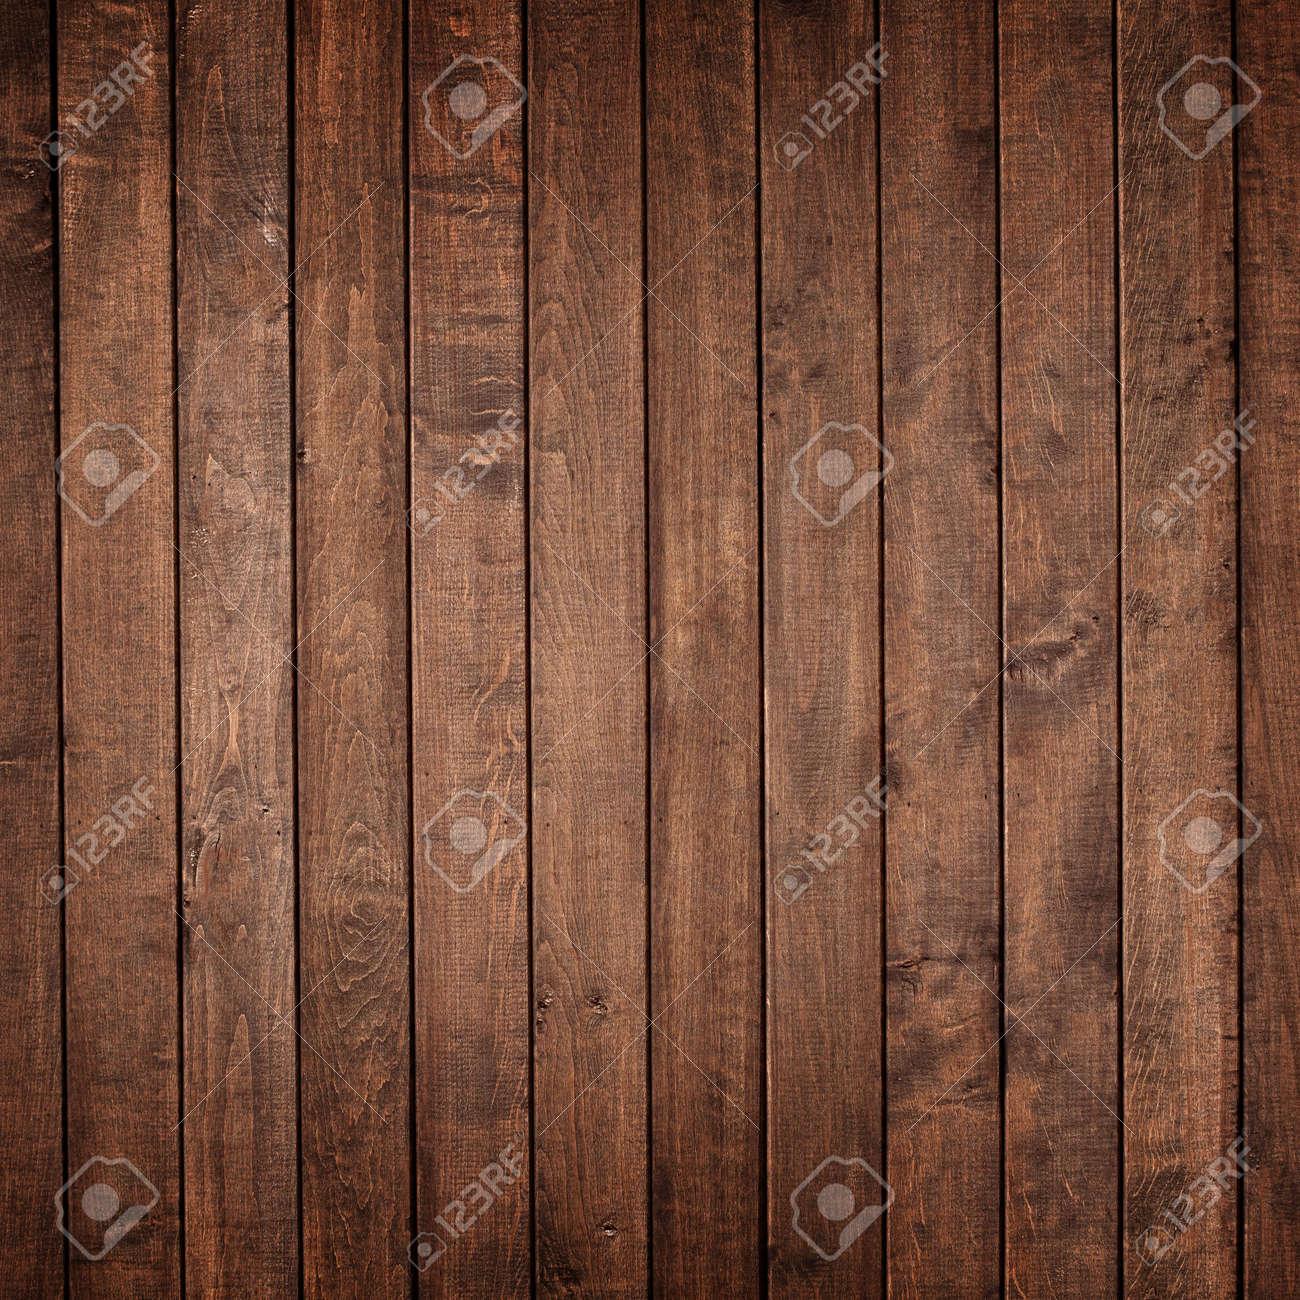 grunge wood panels - 48740675